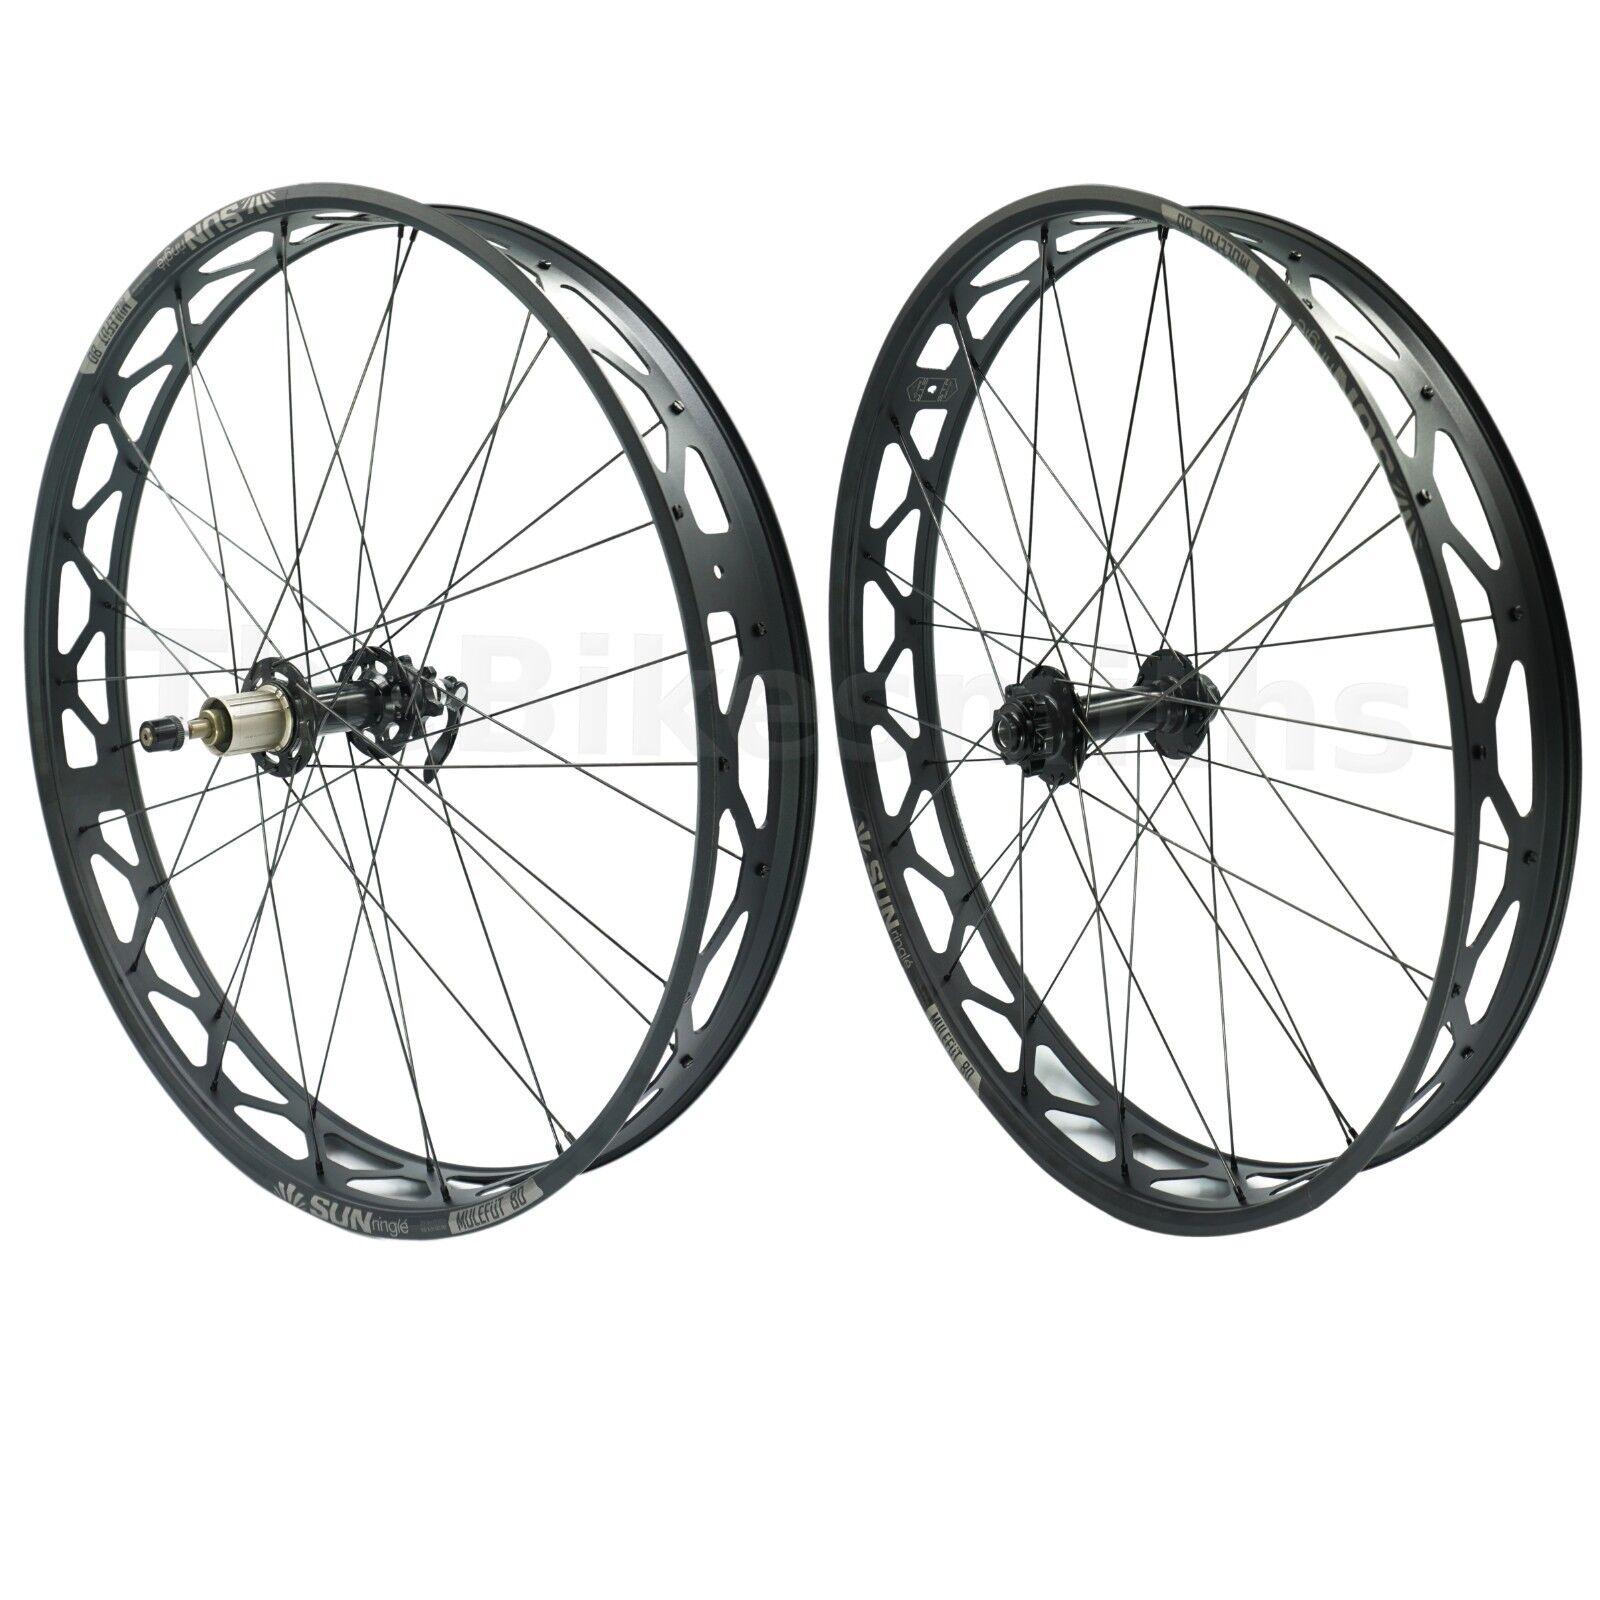 Sun Ringle MULEFUT 80SL V2 15x15mm TA Front & 170mm QR Rear Fat Cykel Wheelset